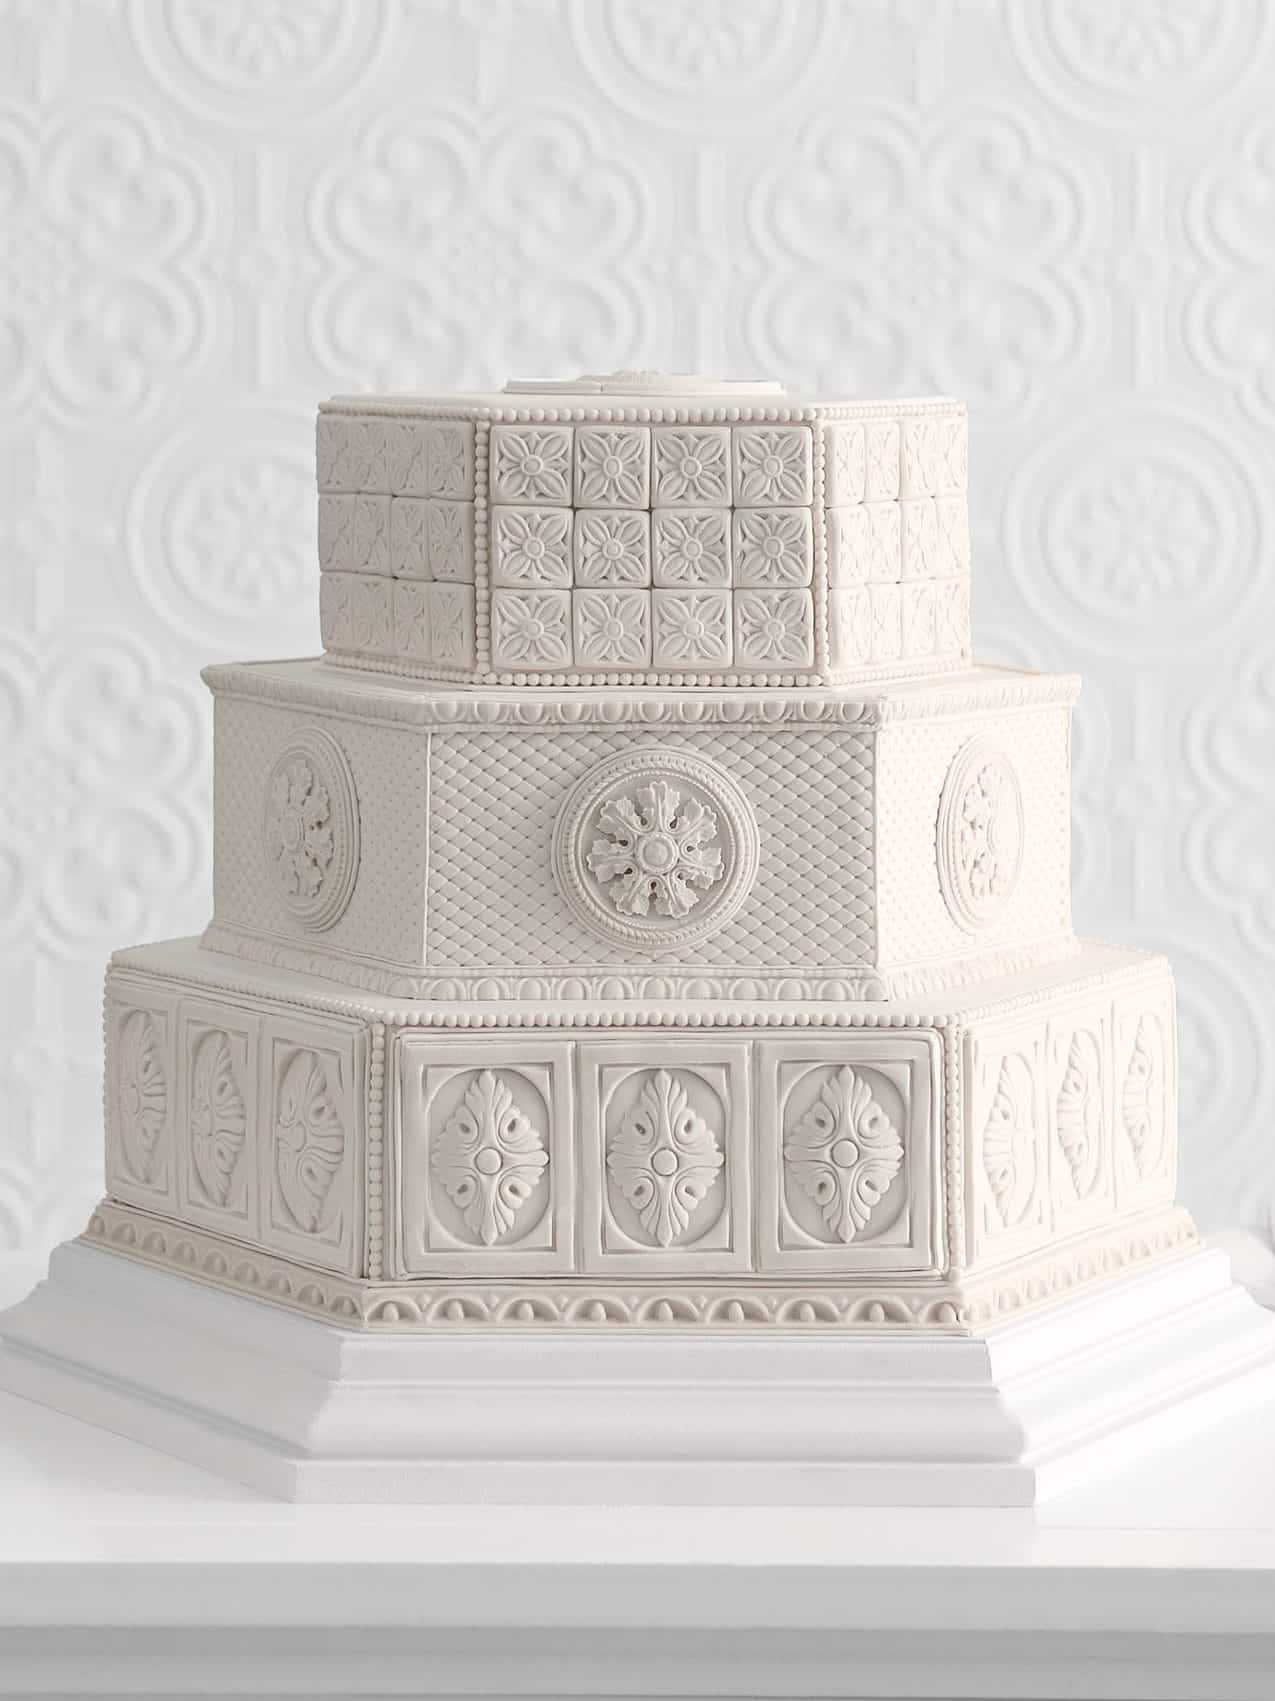 wedding cake in mosaic style